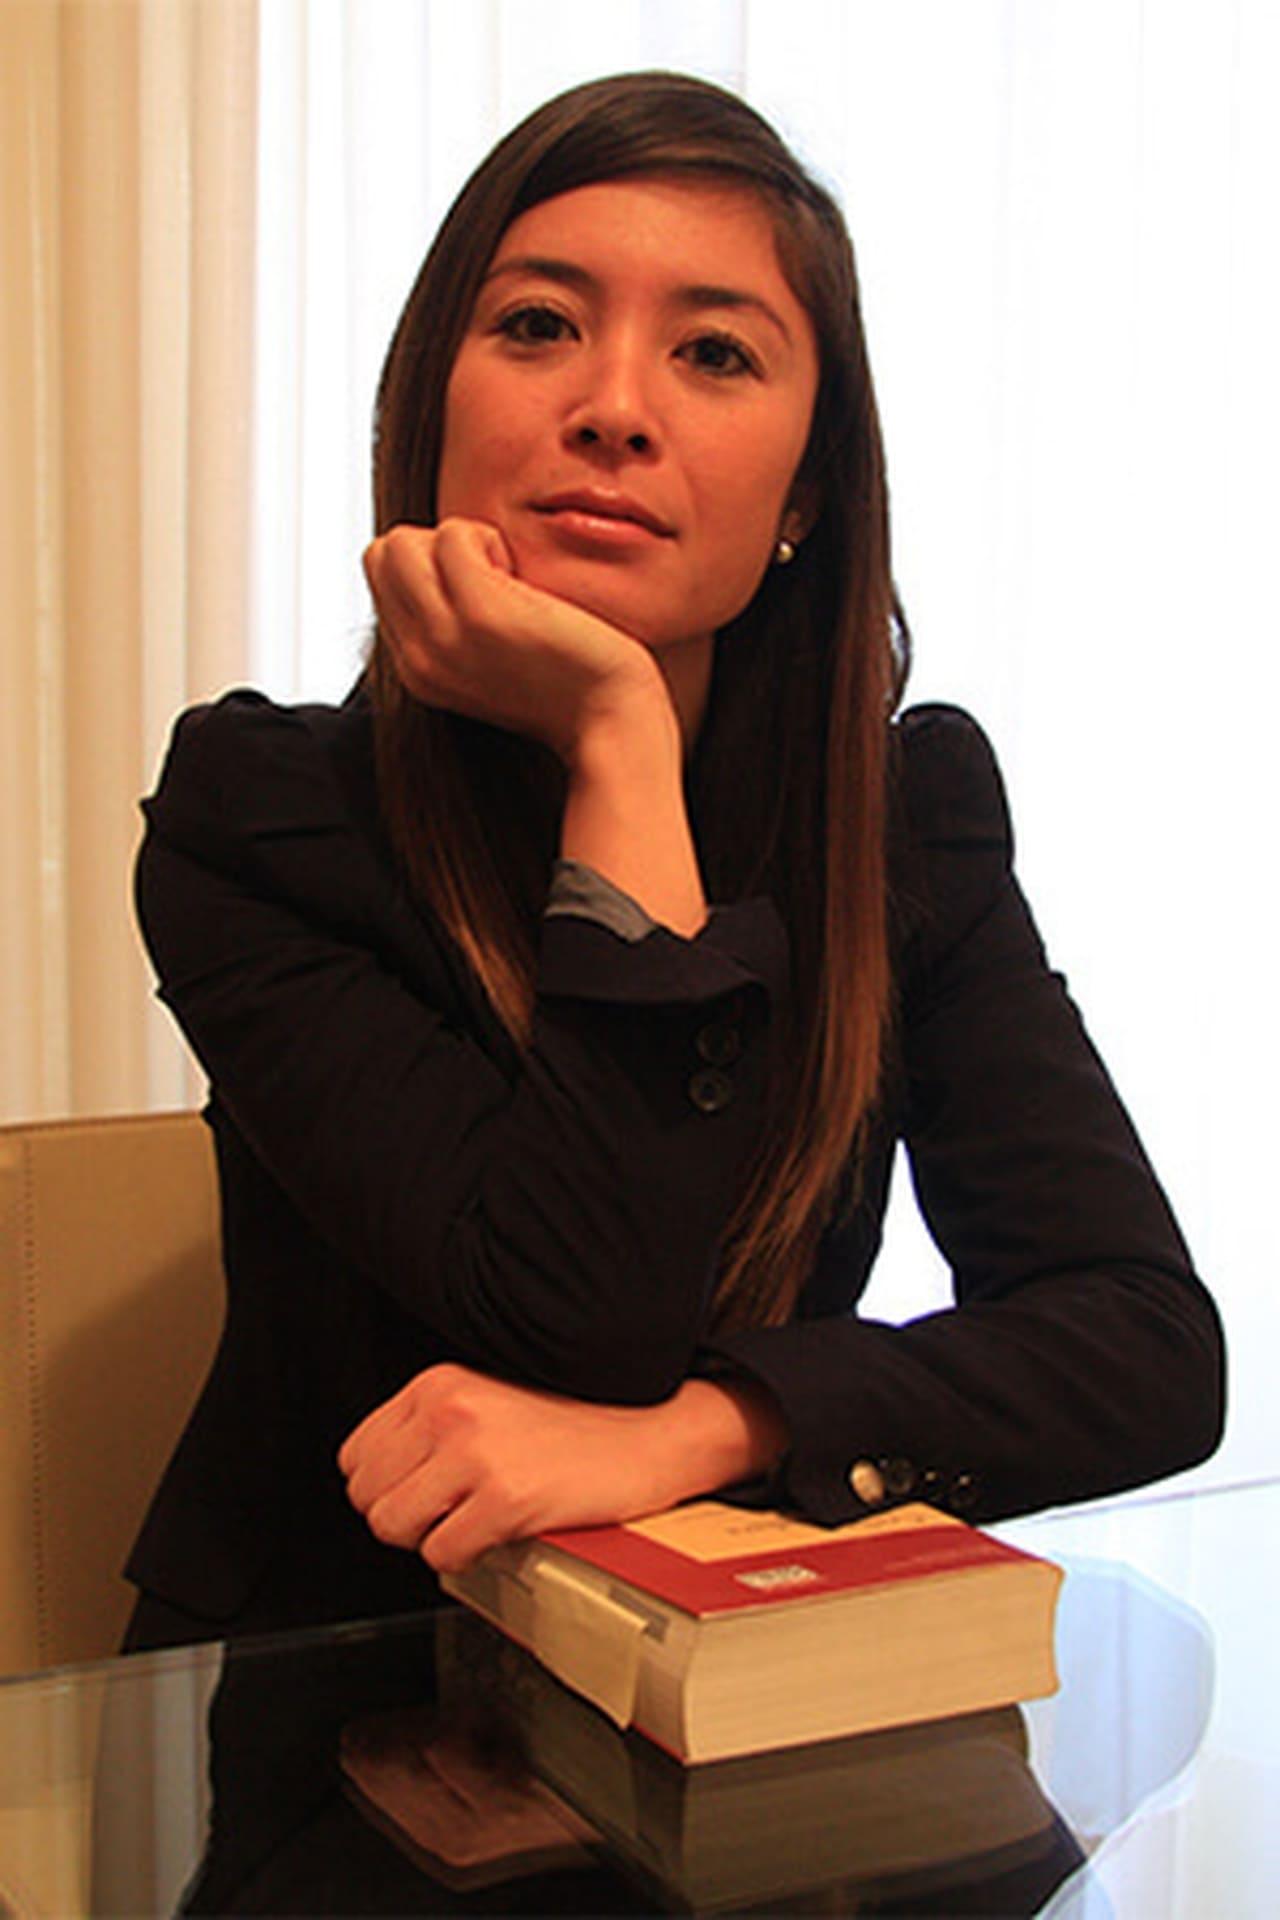 Eiko Yamada isMai (voice)